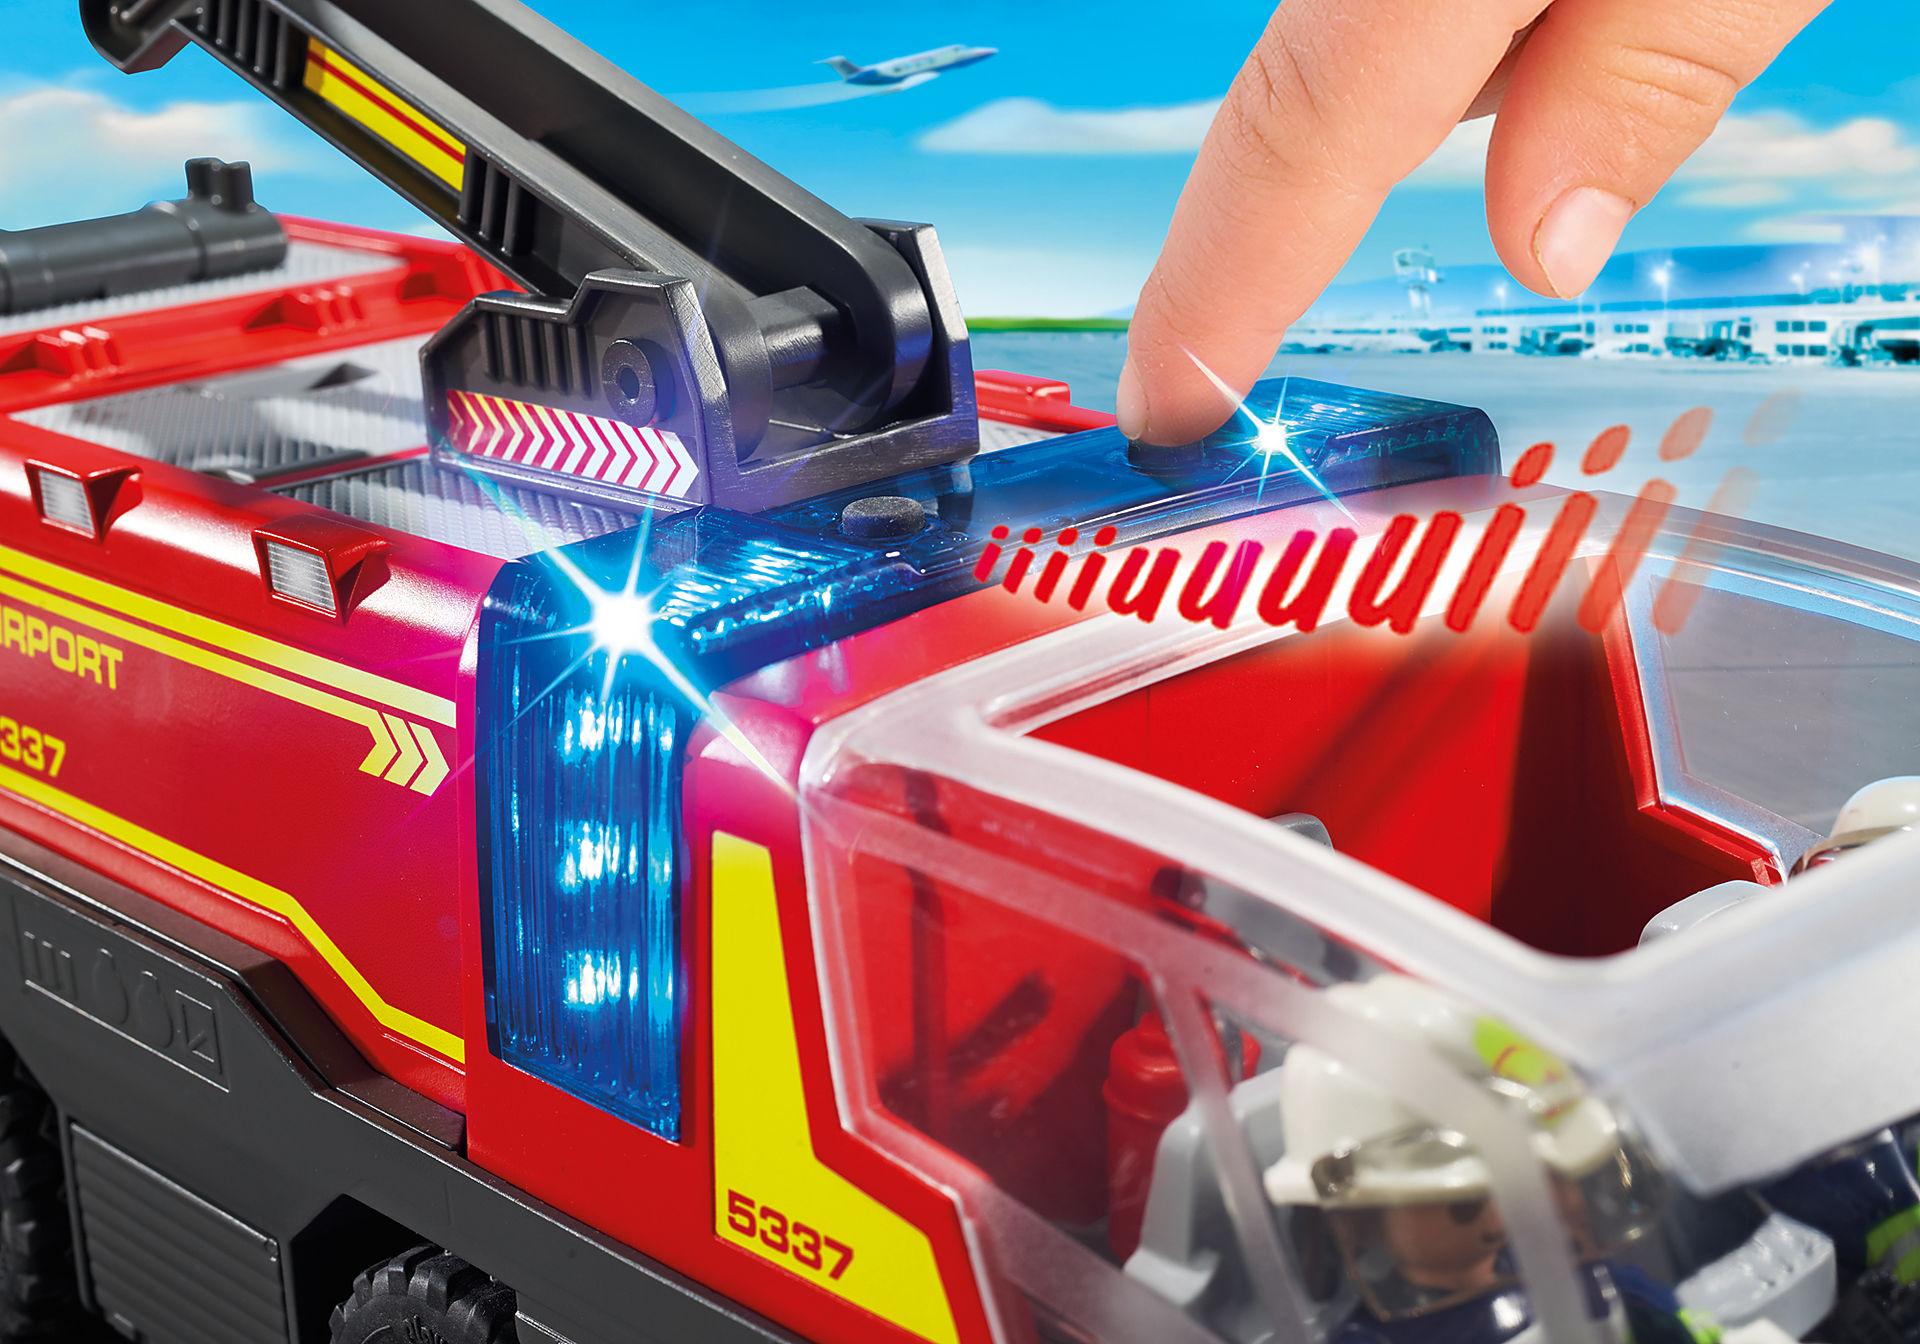 5337 Lufthavnsbrandbil med lys og lyd zoom image5